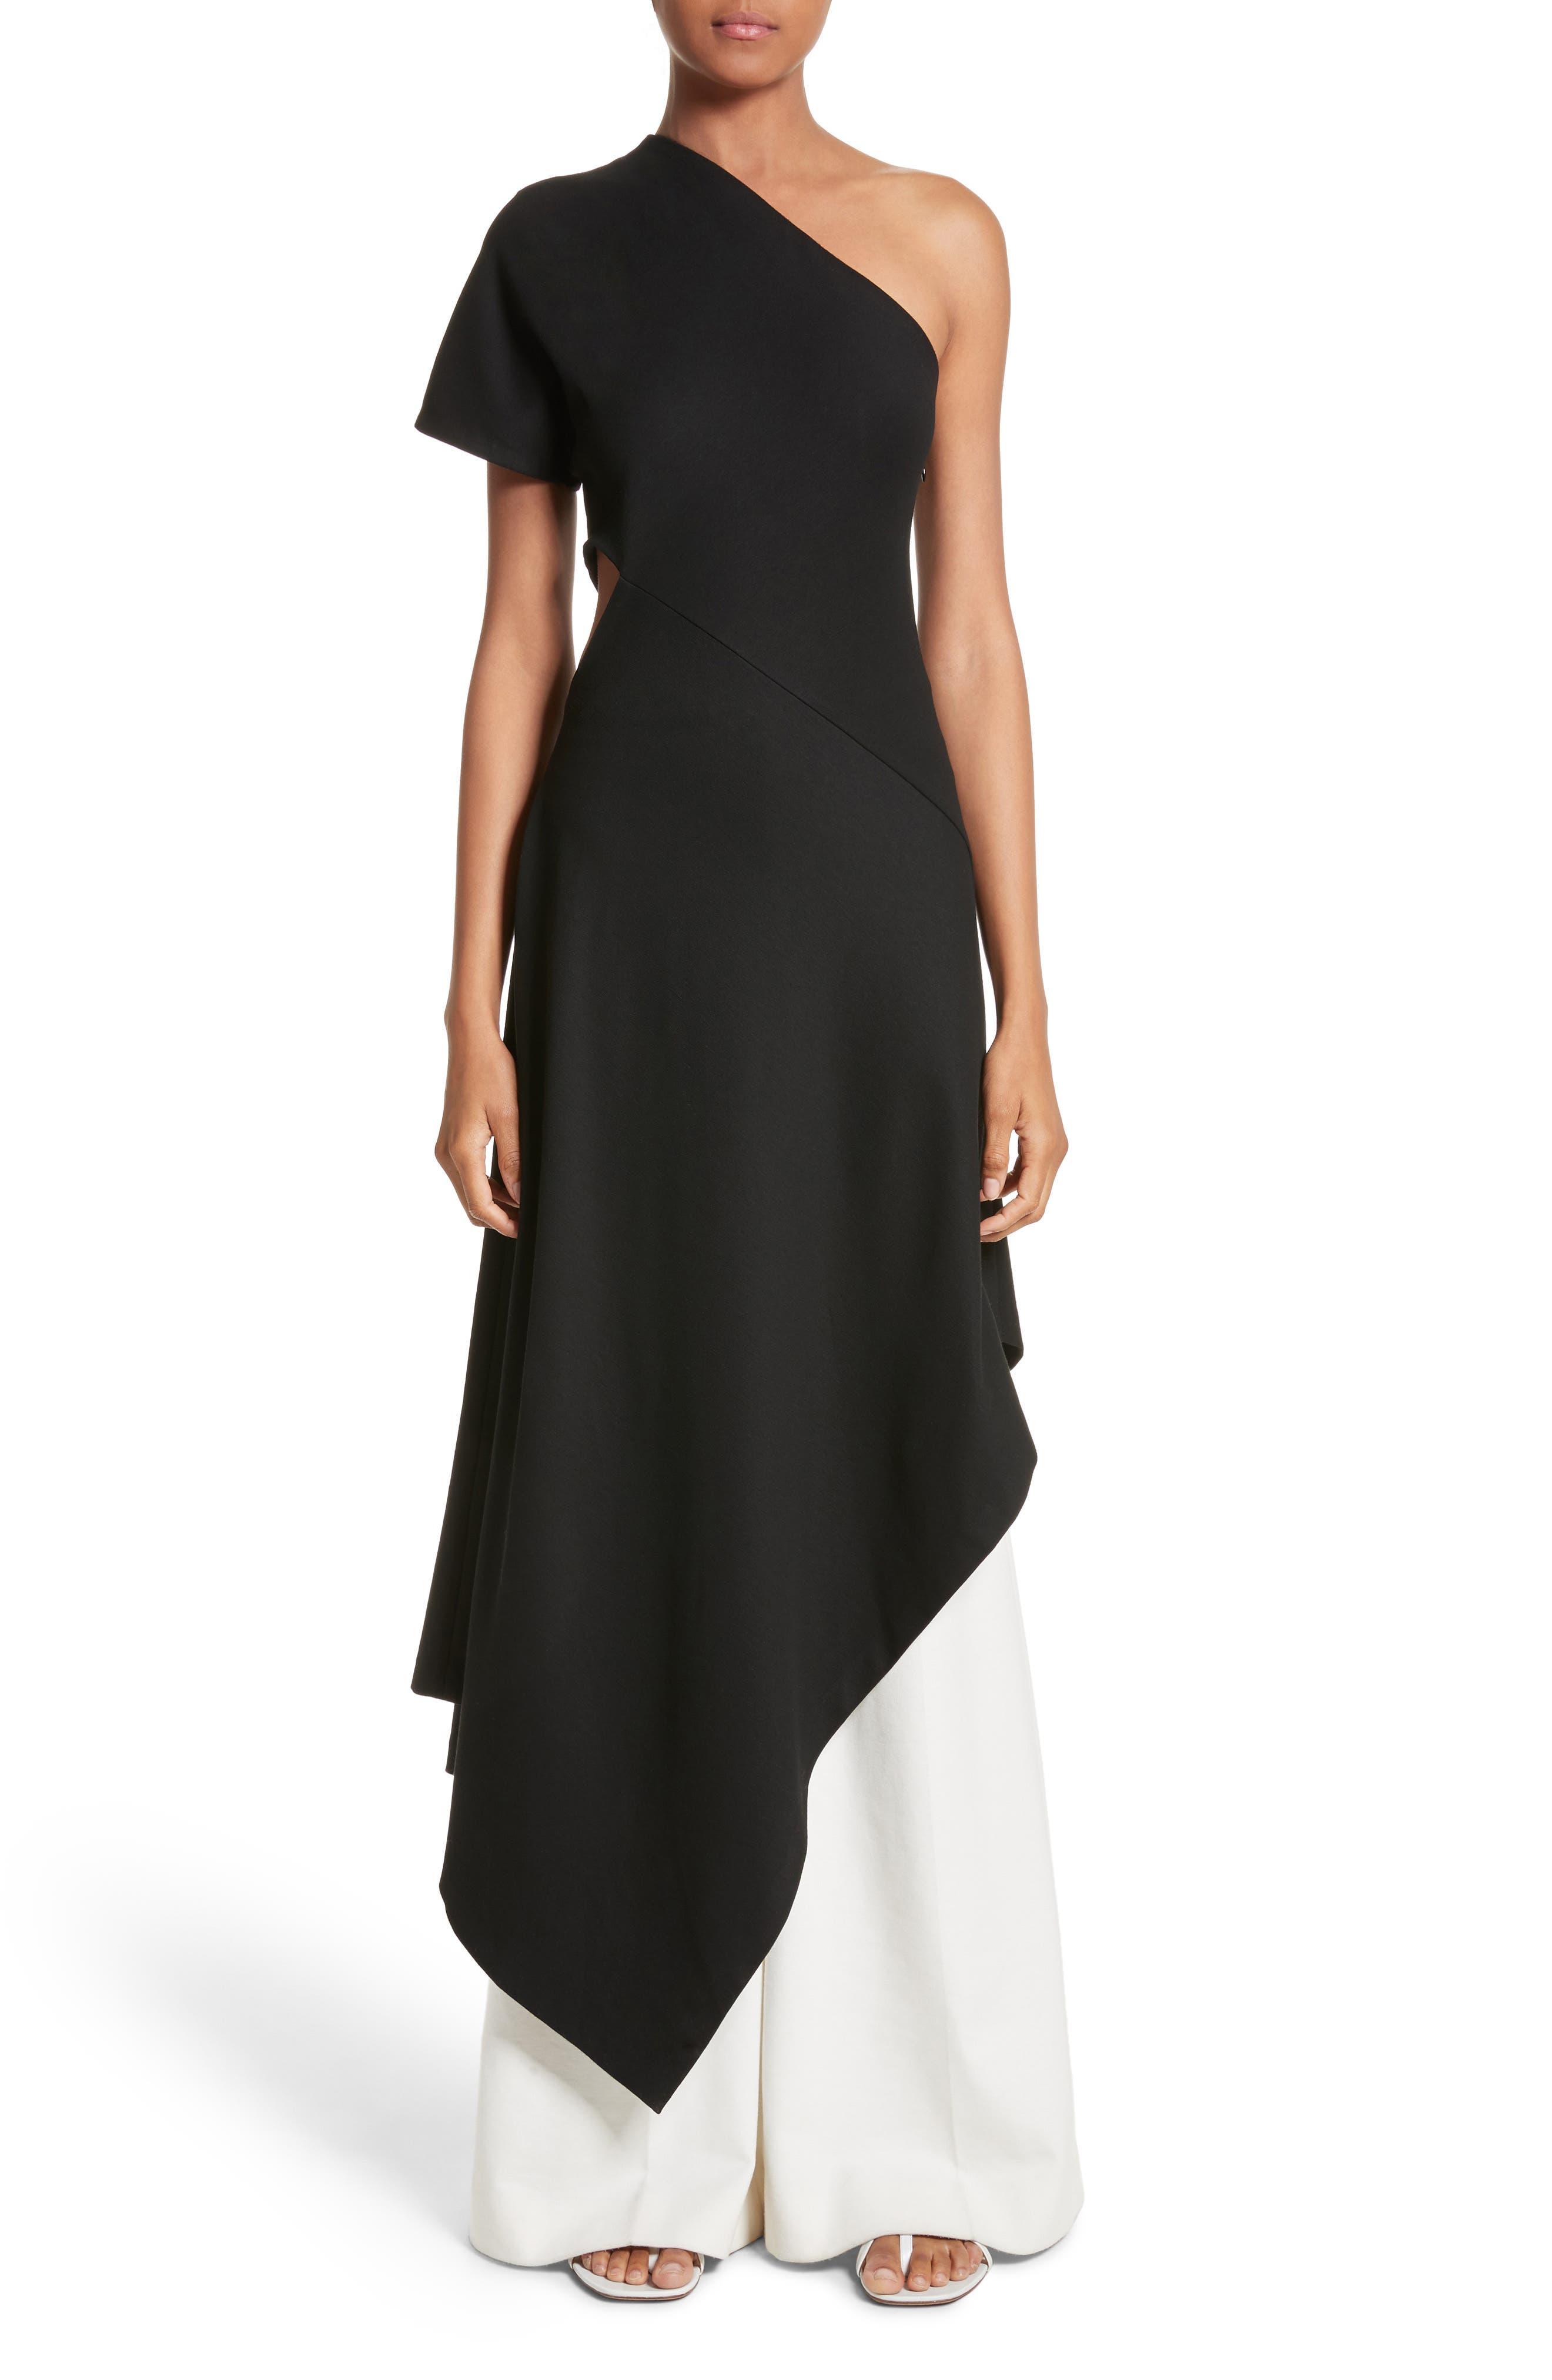 Main Image - Rosetta Getty One-Shoulder Asymmetrical Jersey Dress